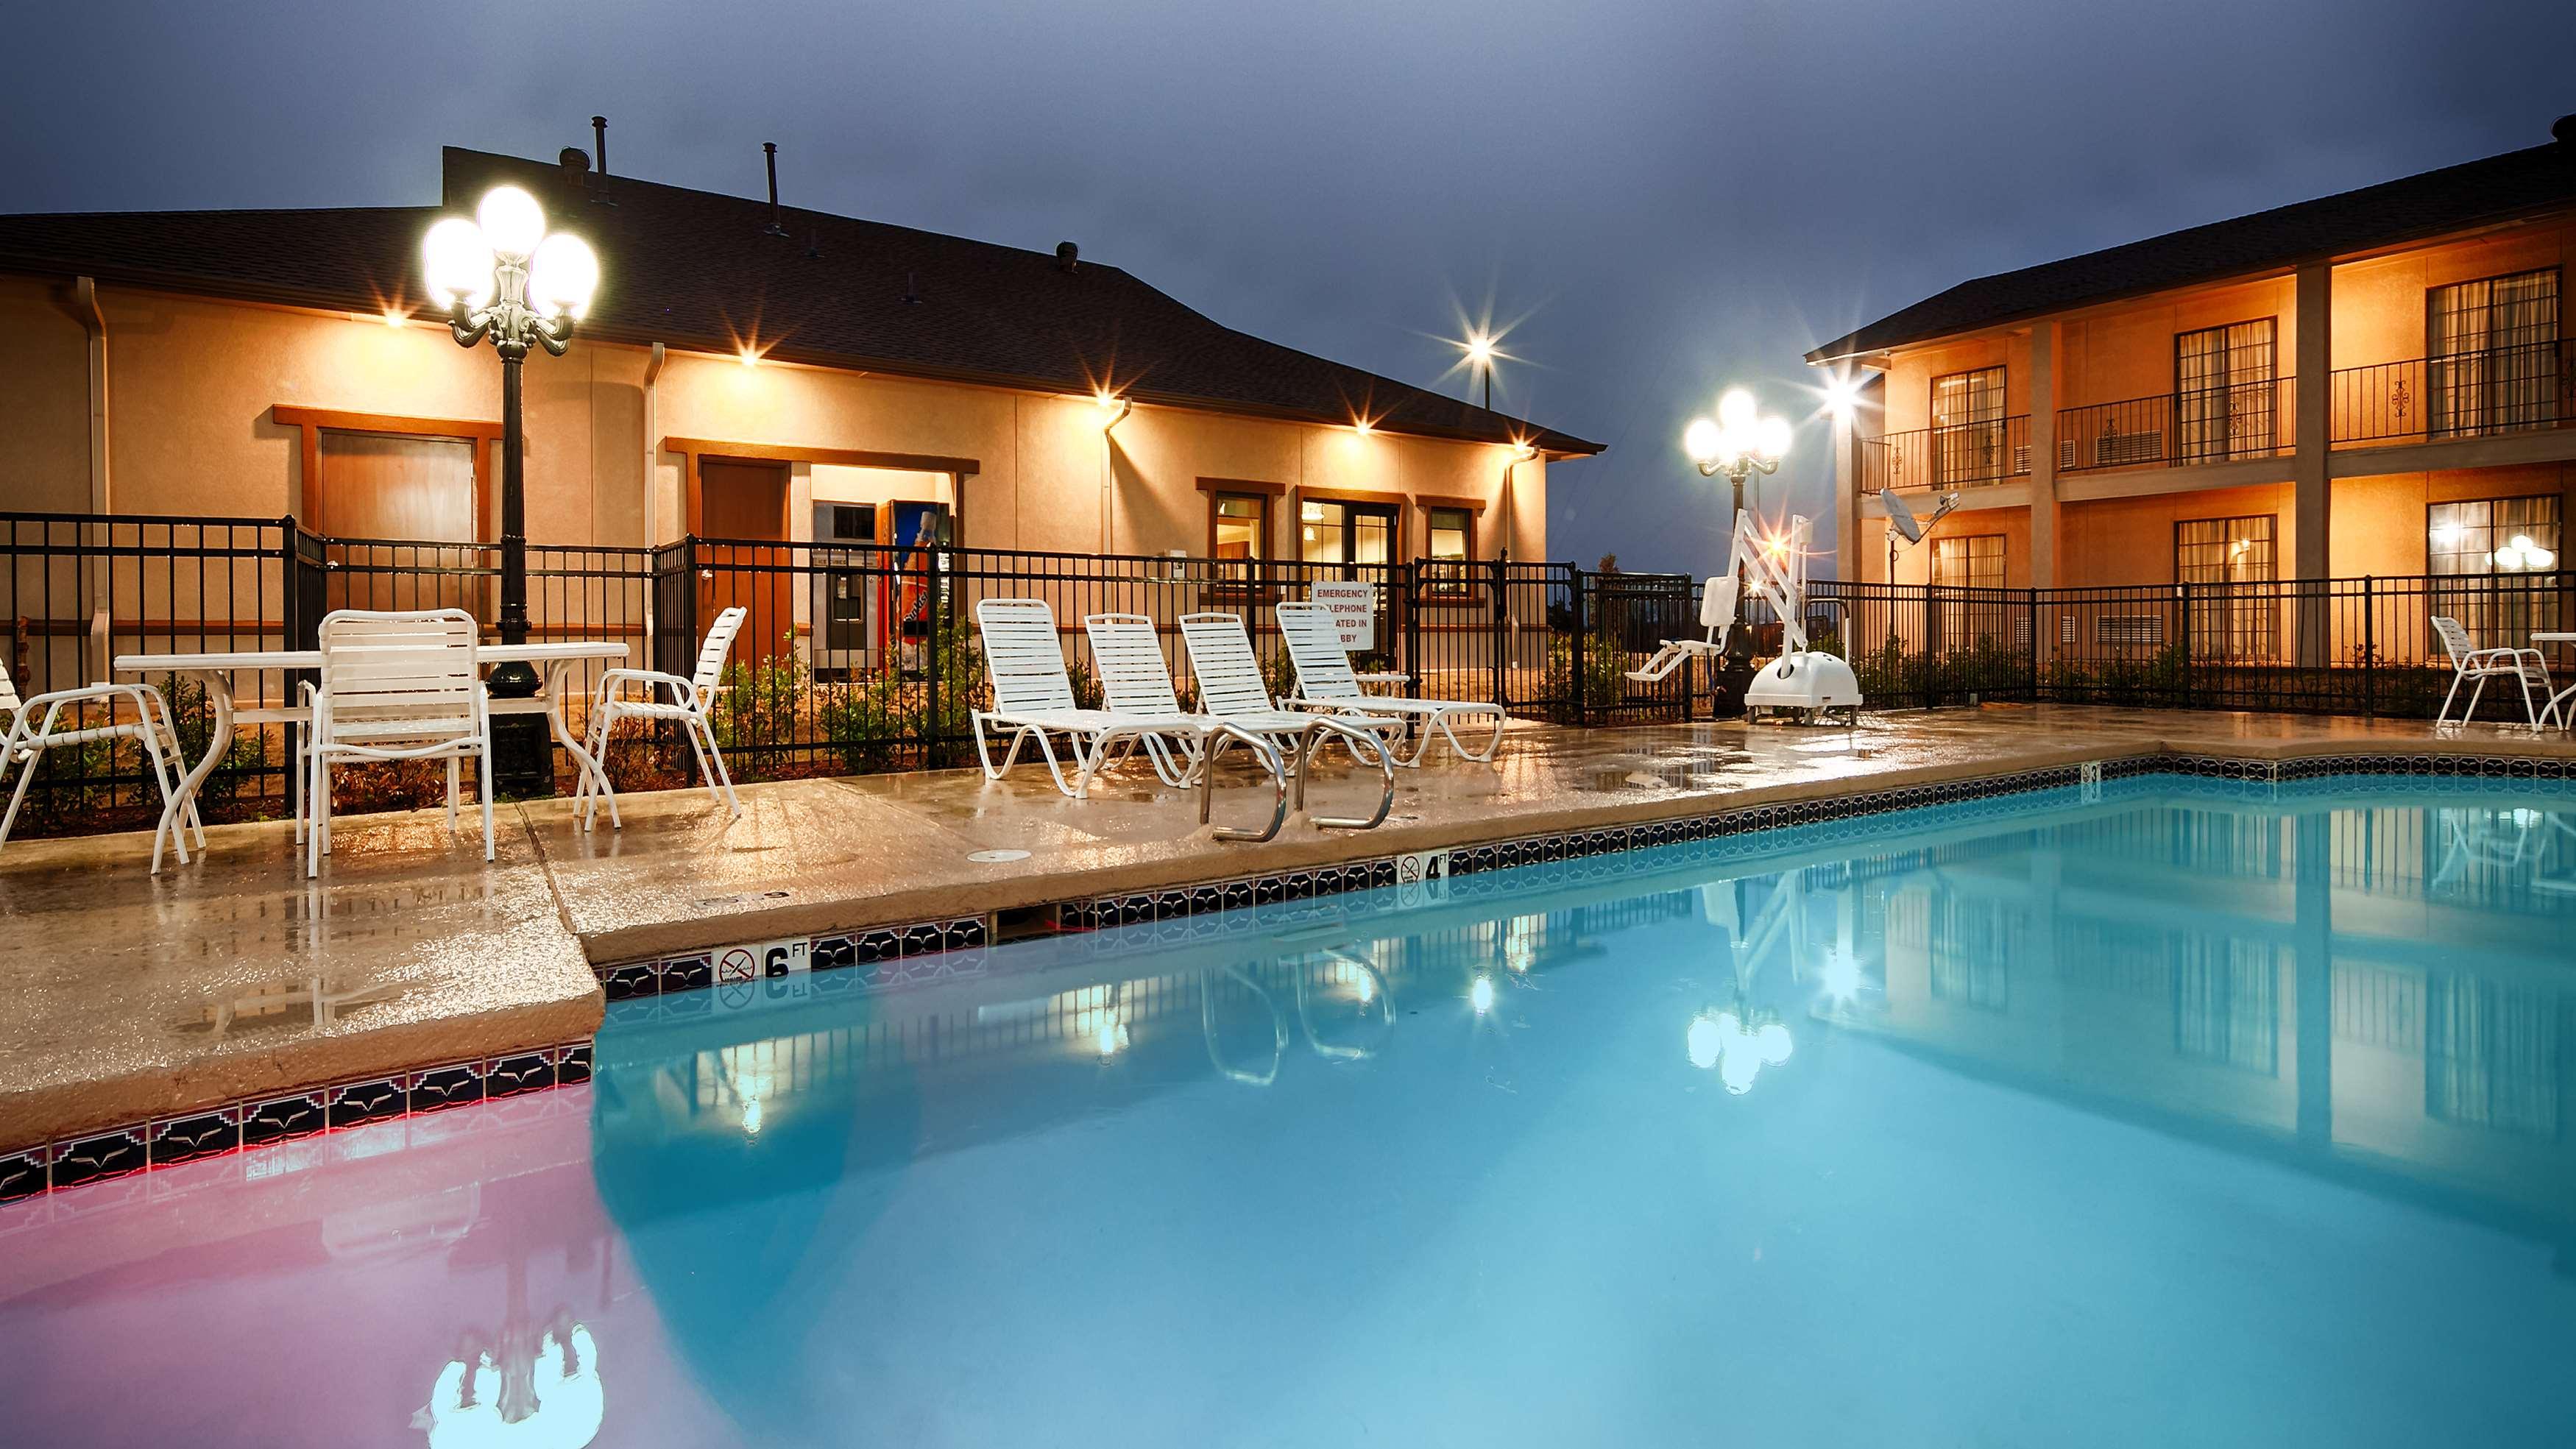 Best Western Trail Dust Inn & Suites image 3